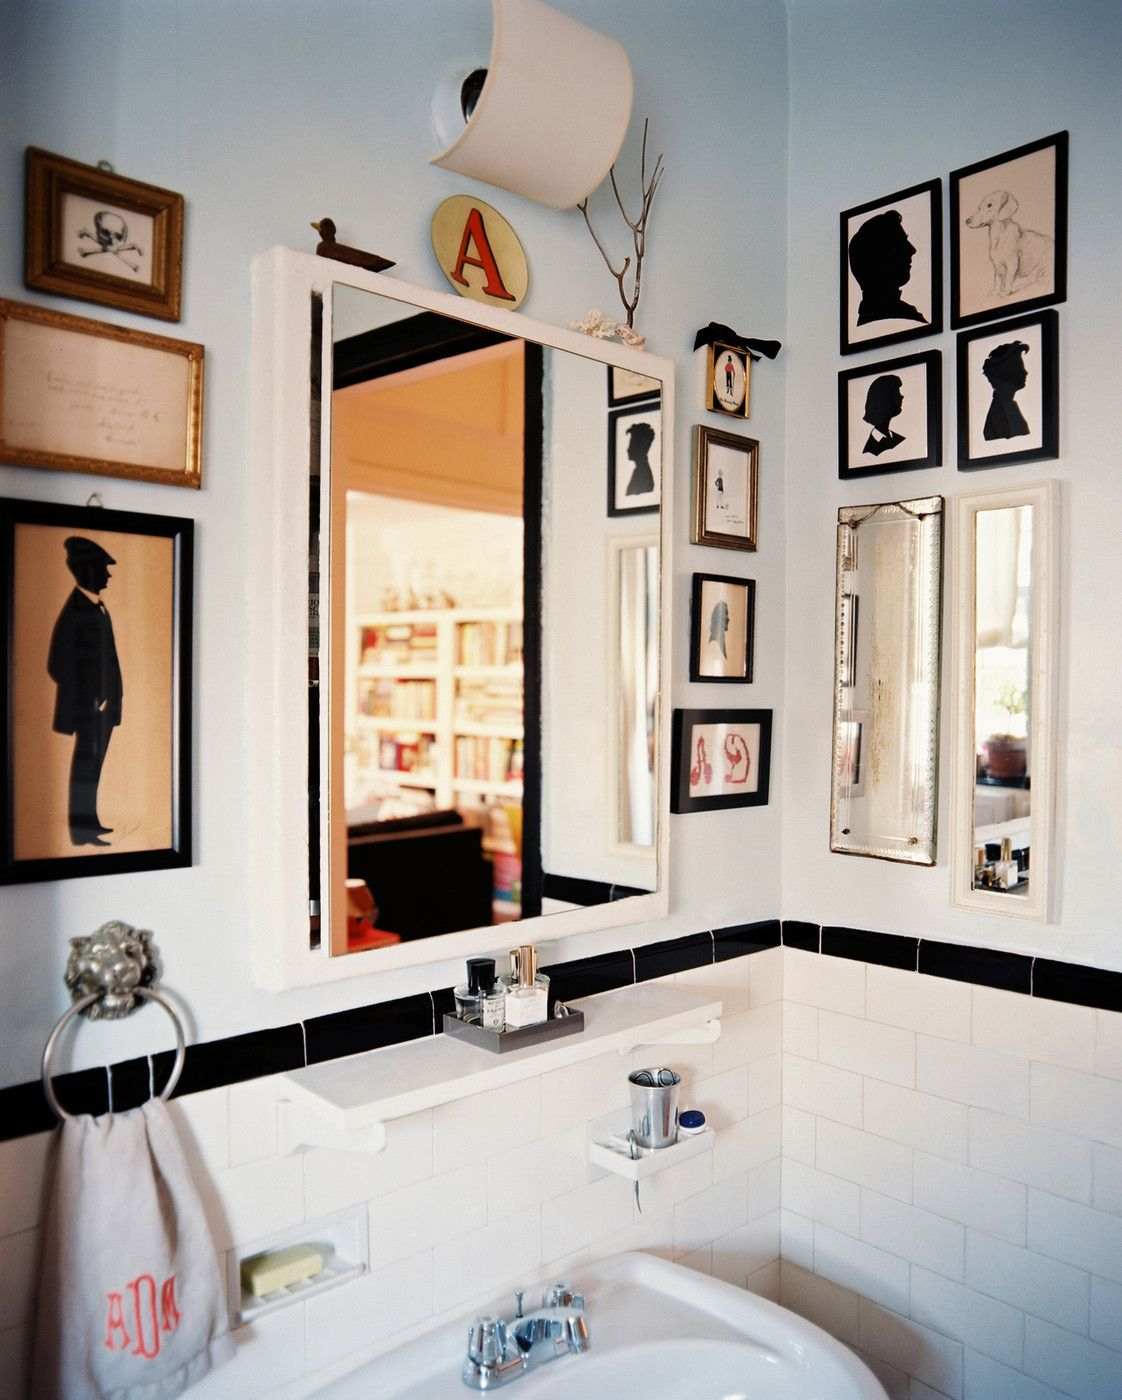 Black And White All Over Artworks Monogrammed Hand Towels And - Monogrammed hand towels for small bathroom ideas